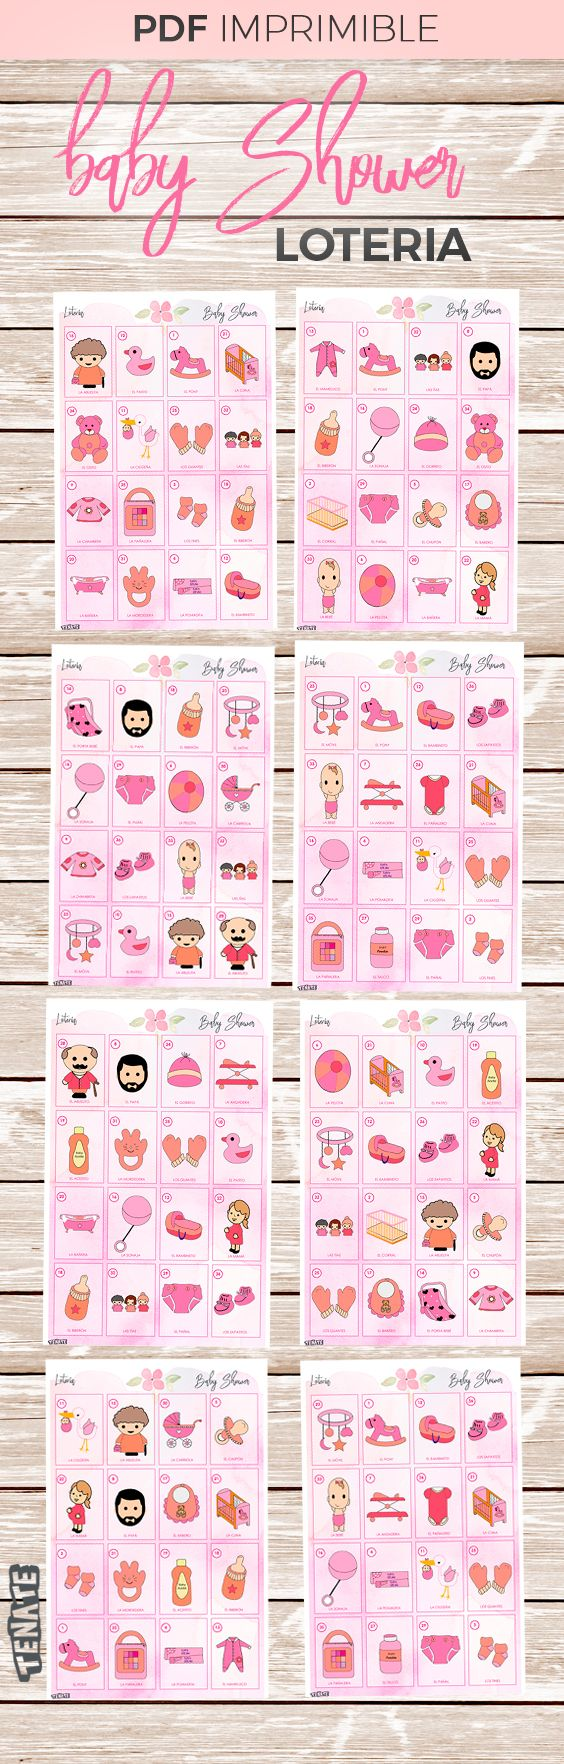 Loteria Para Baby Shower Nina Baby Shower Pinterest Baby